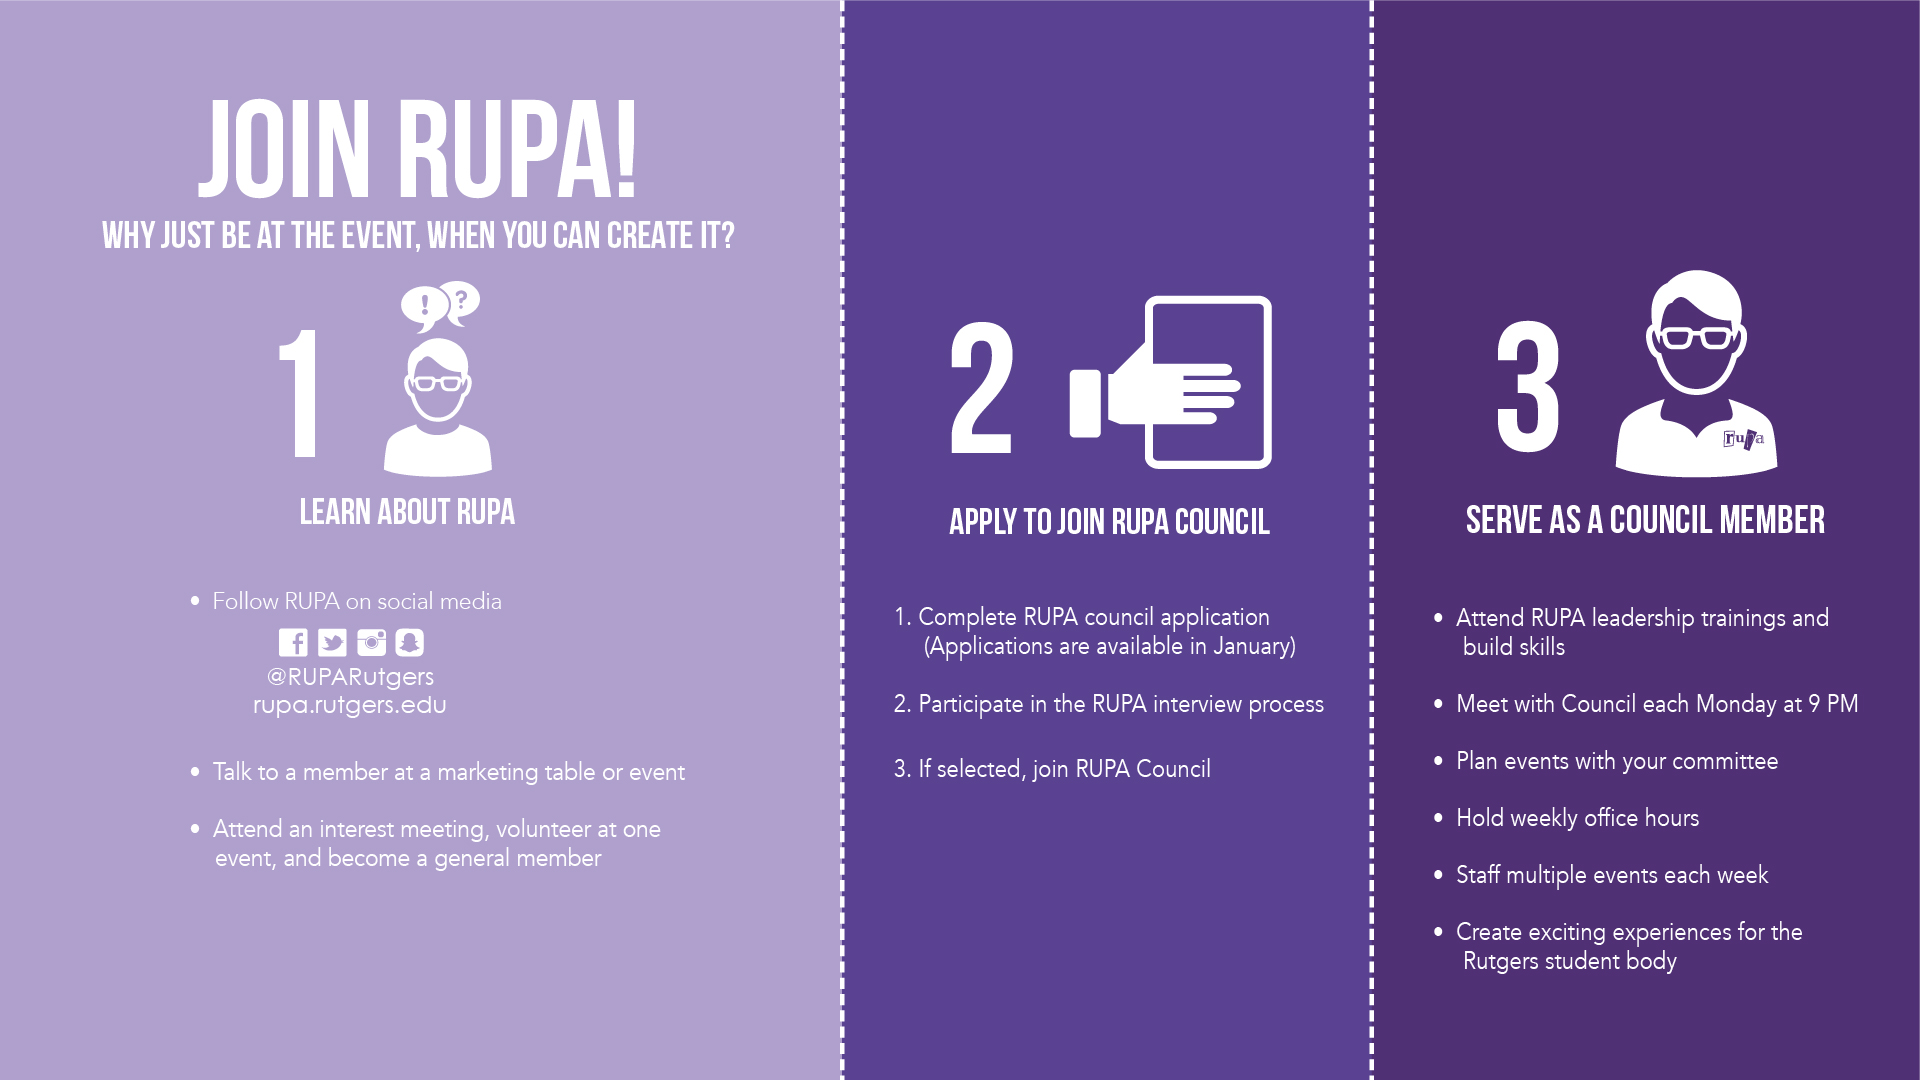 5587_Join_RUPA!_digital-01